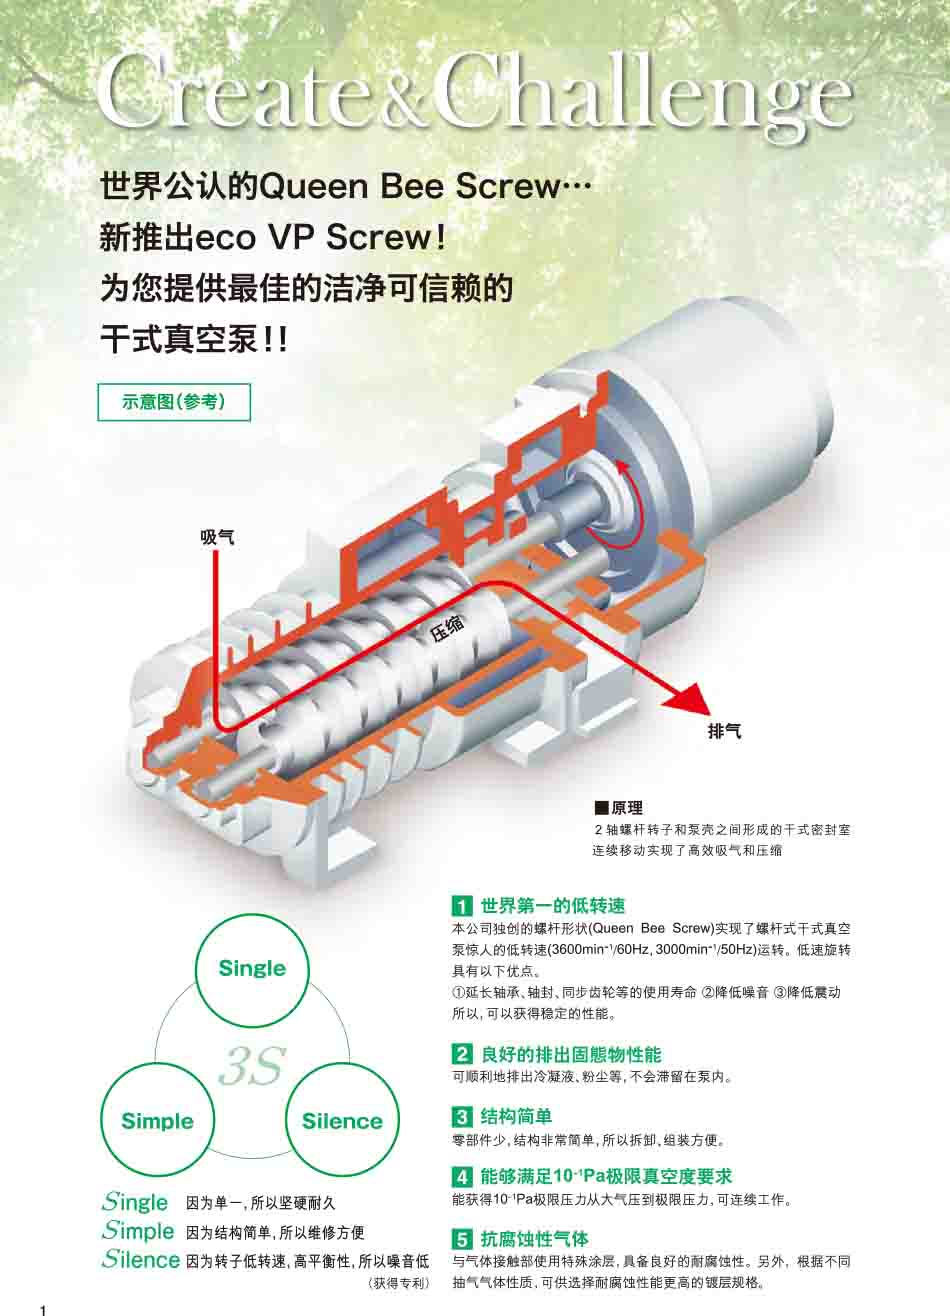 Taiko大晃真空泵SDV-30特点